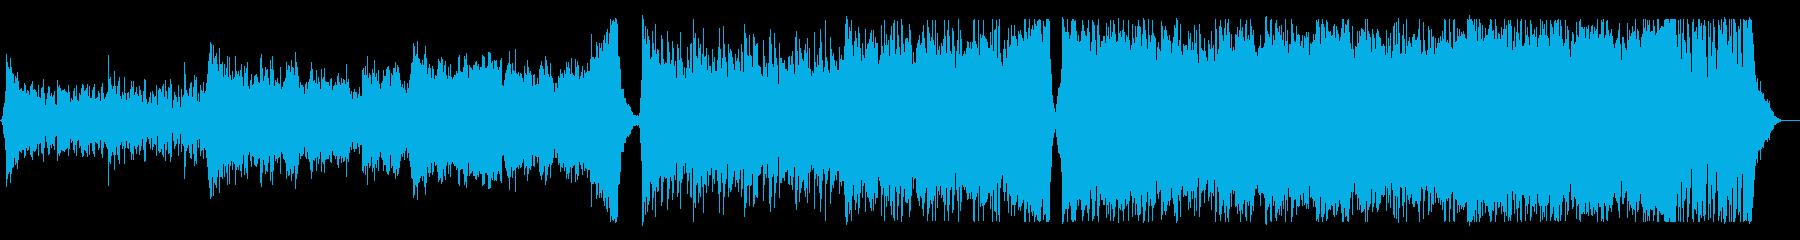 Epic/力強いエンディング曲の再生済みの波形